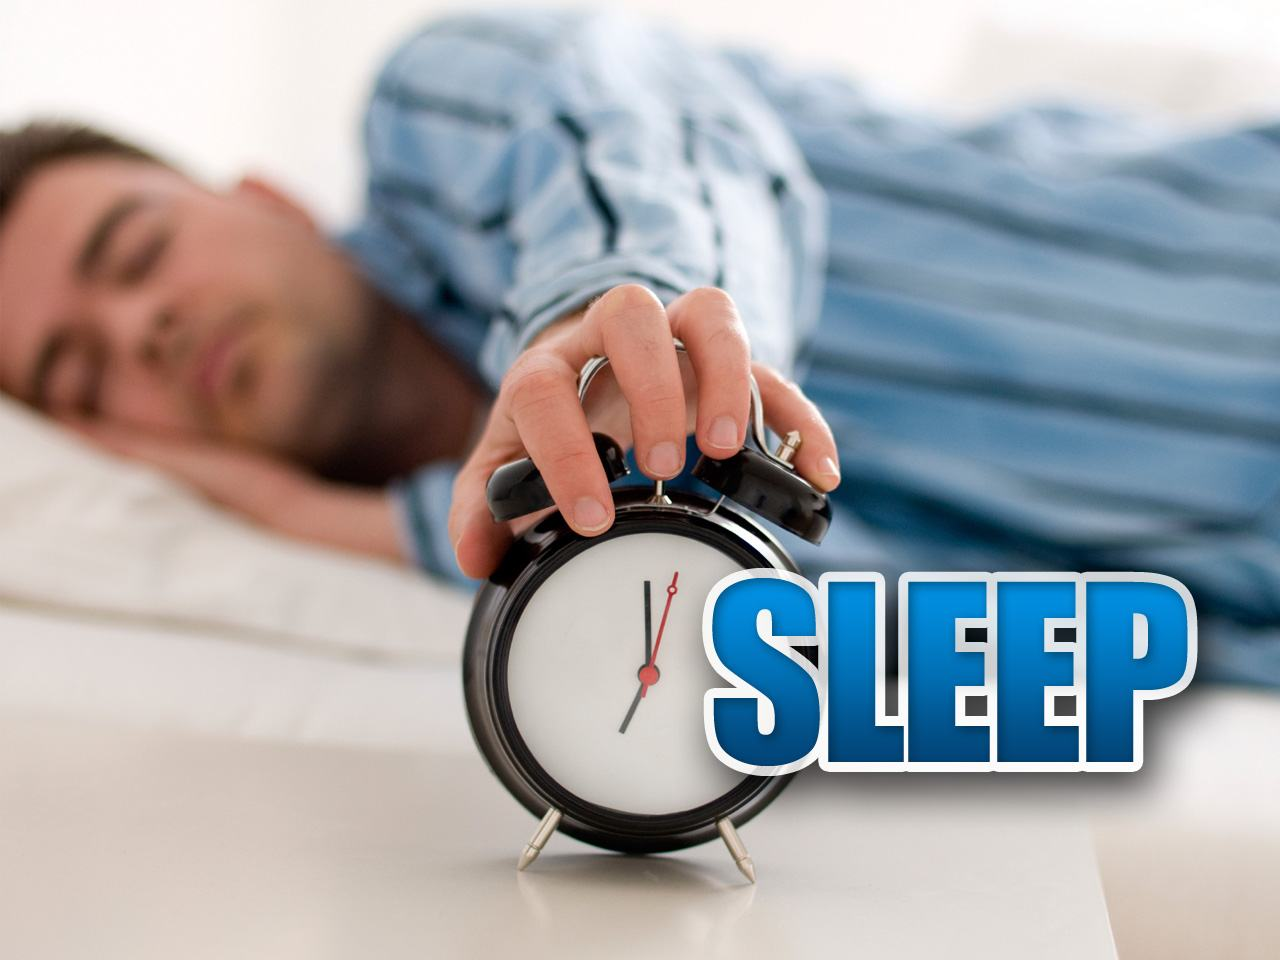 Slaap uit na late avondtraining